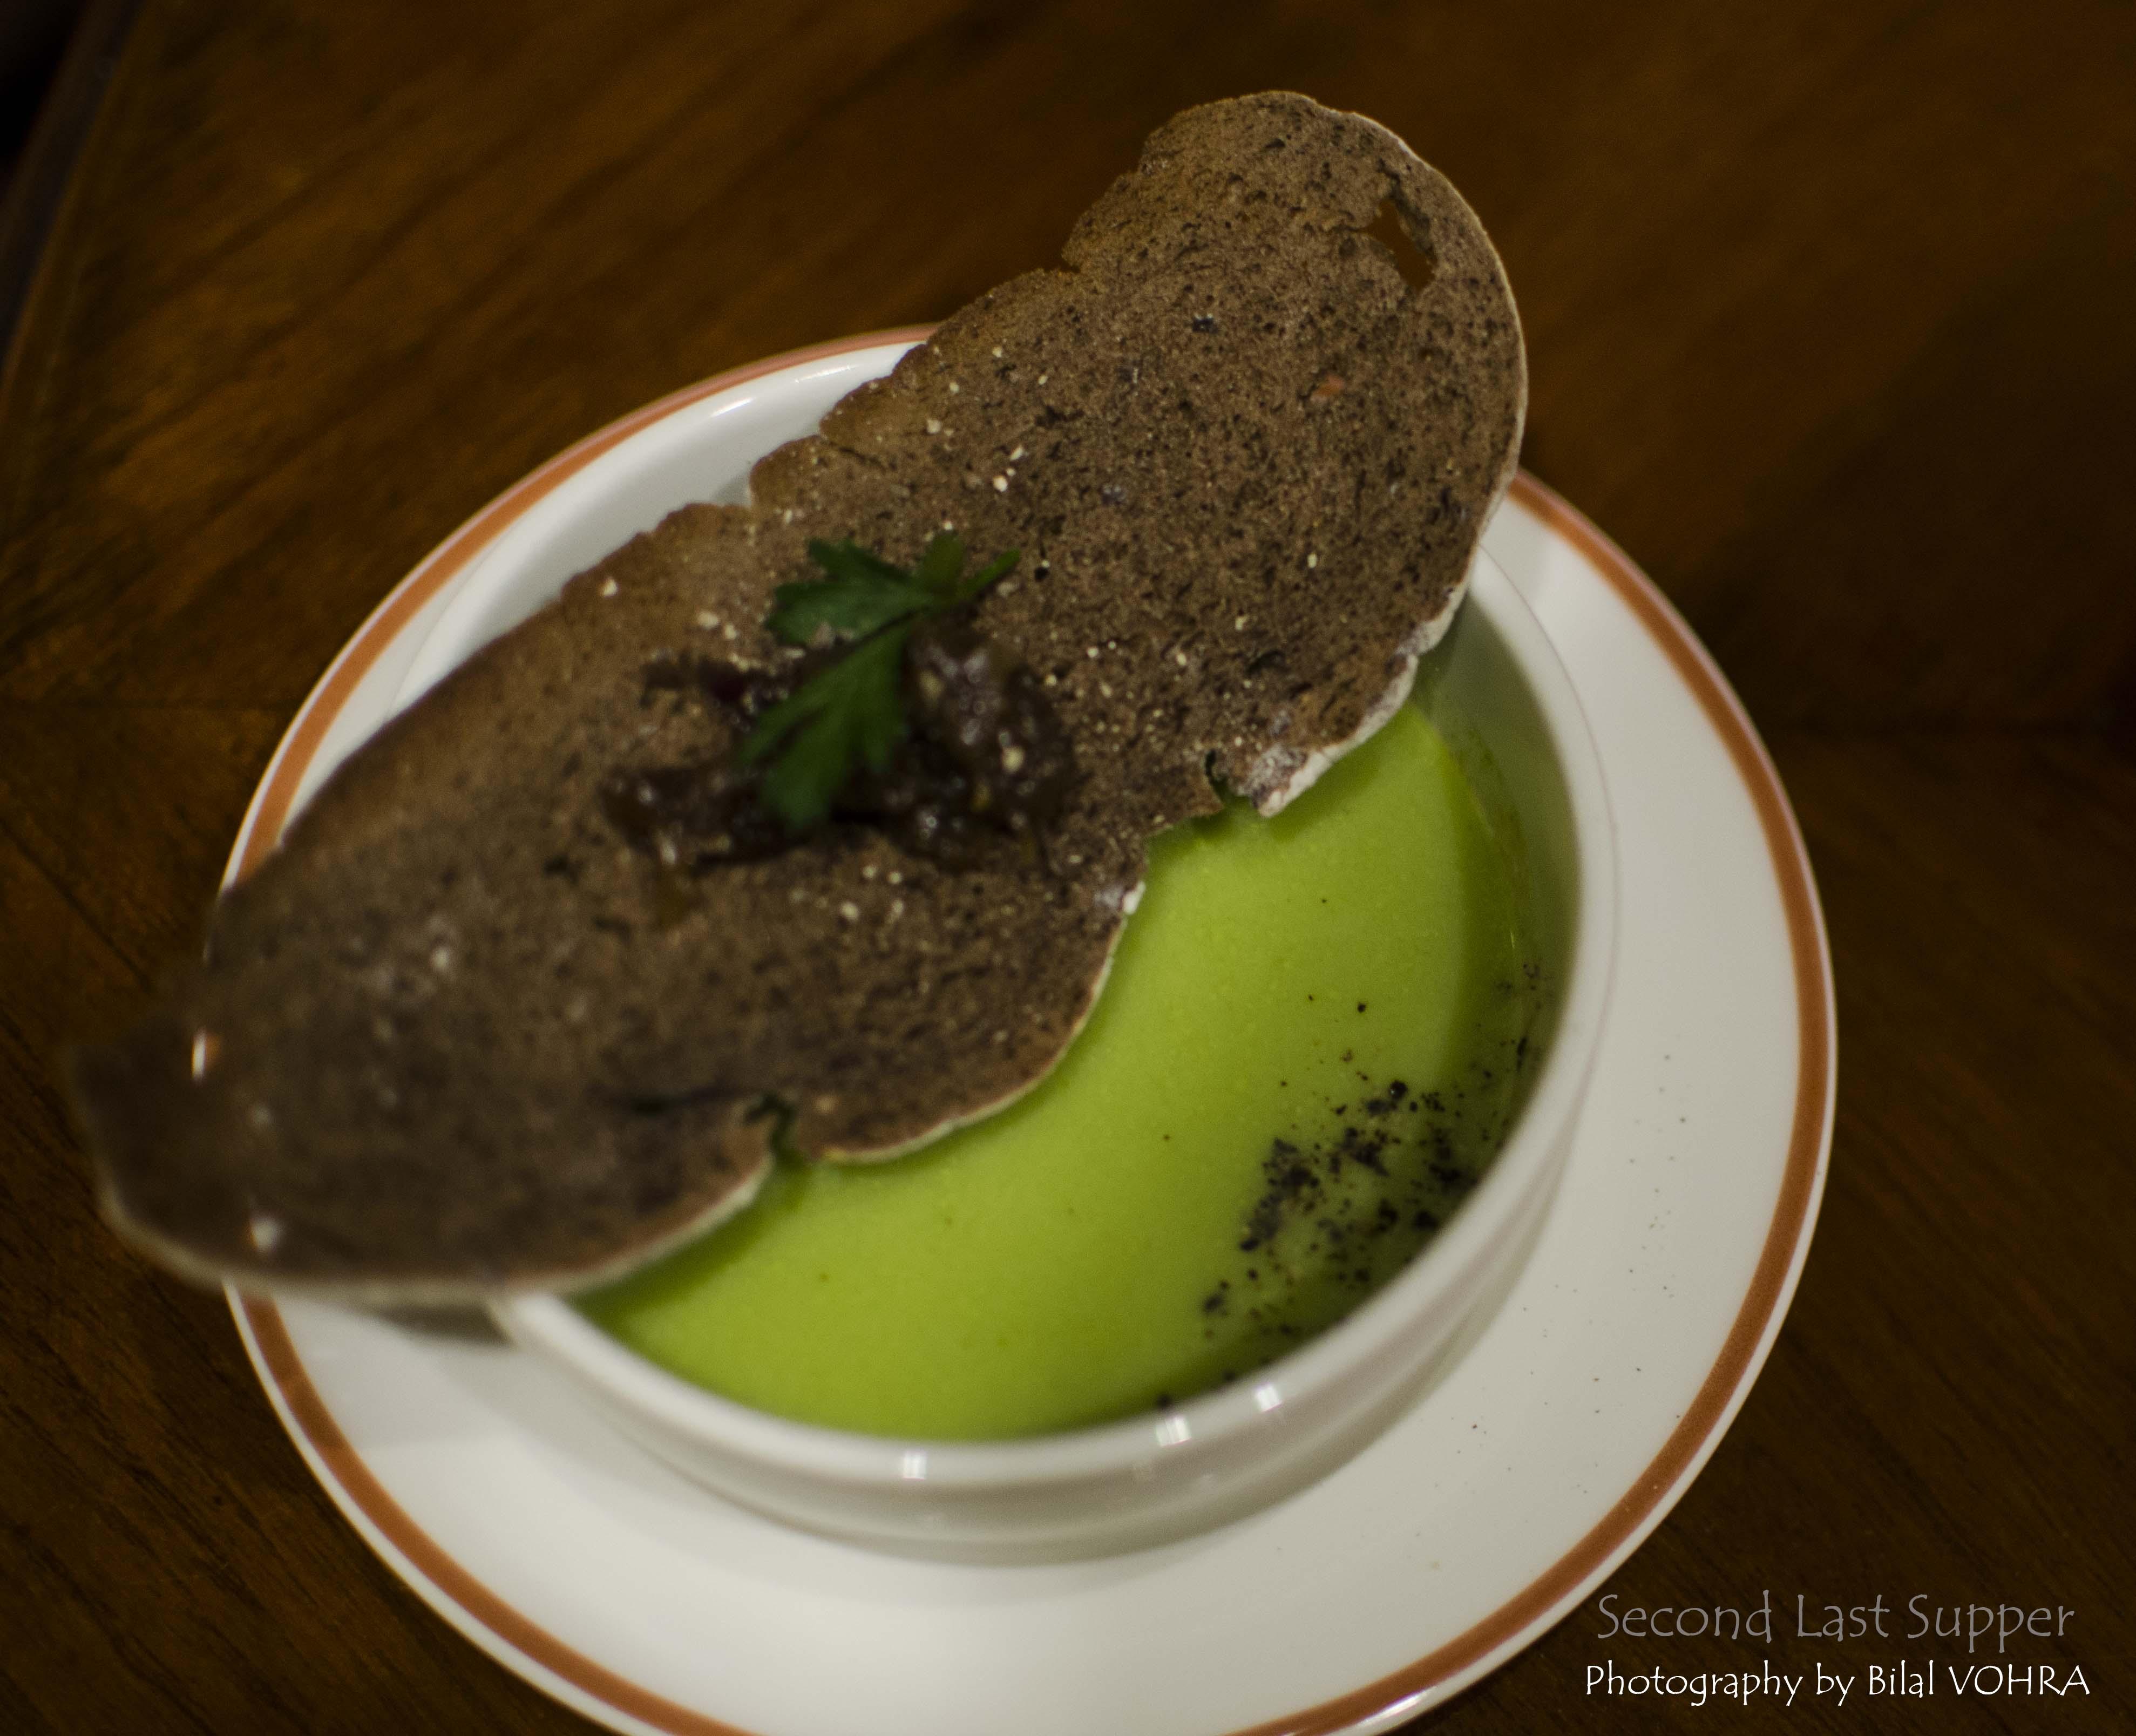 Velutata tiepida di asparagi, cipolla caramellata pane rye croccante (wam asparagus veloute, caramelized onion)